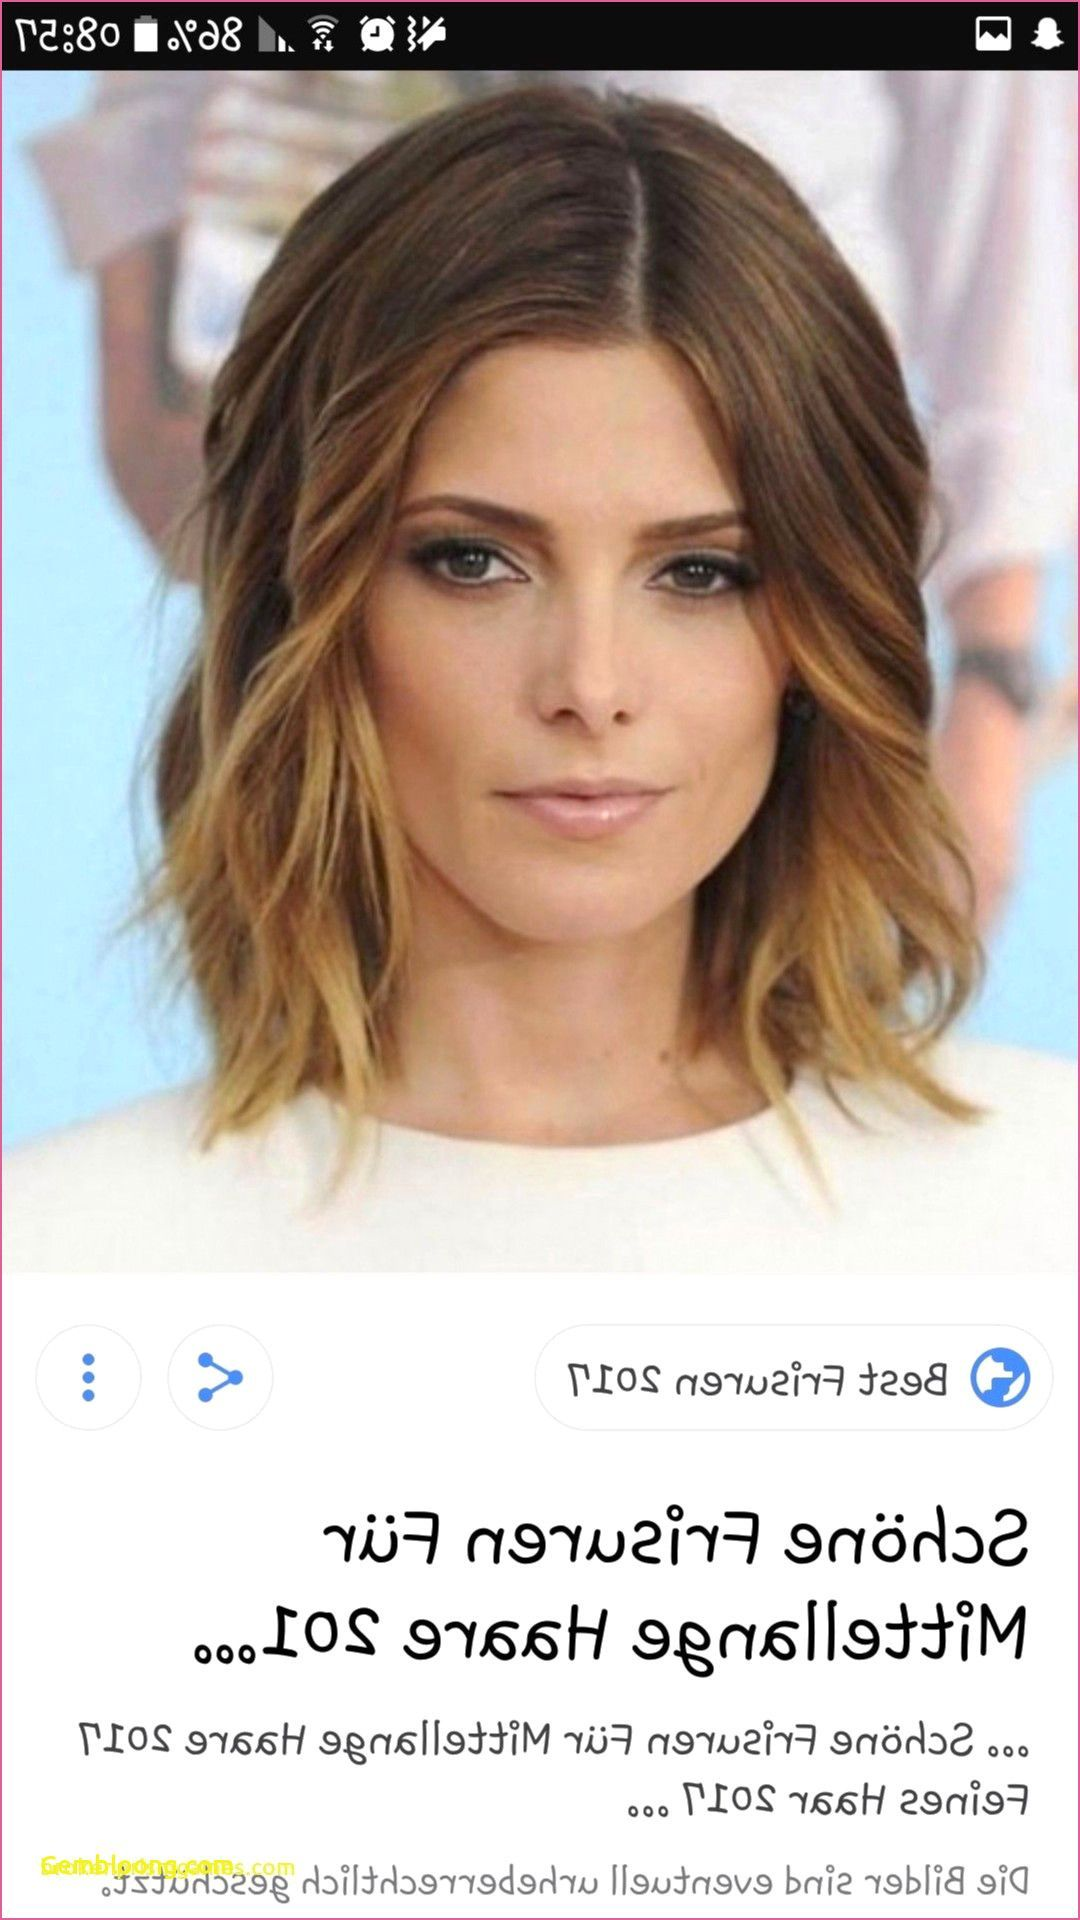 Frisuren Mittellang Stufig 2020 Frisuren Mittellang Stufig Feine Haarschnitte Frisuren Haarschnitt Halblang